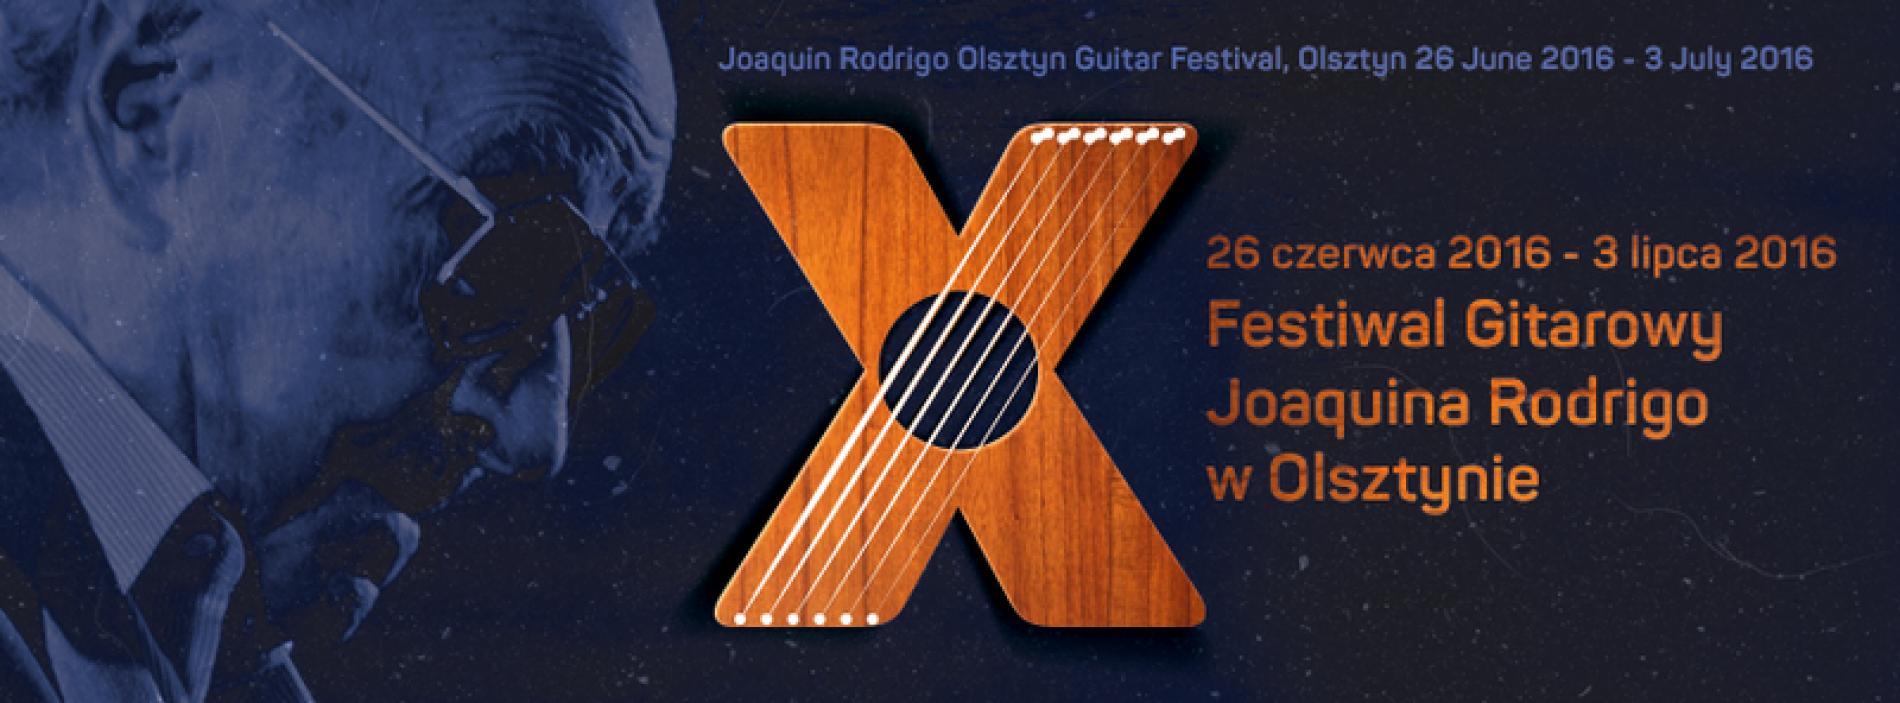 8. Festiwal Gitarowy Joaquina Rodrigo